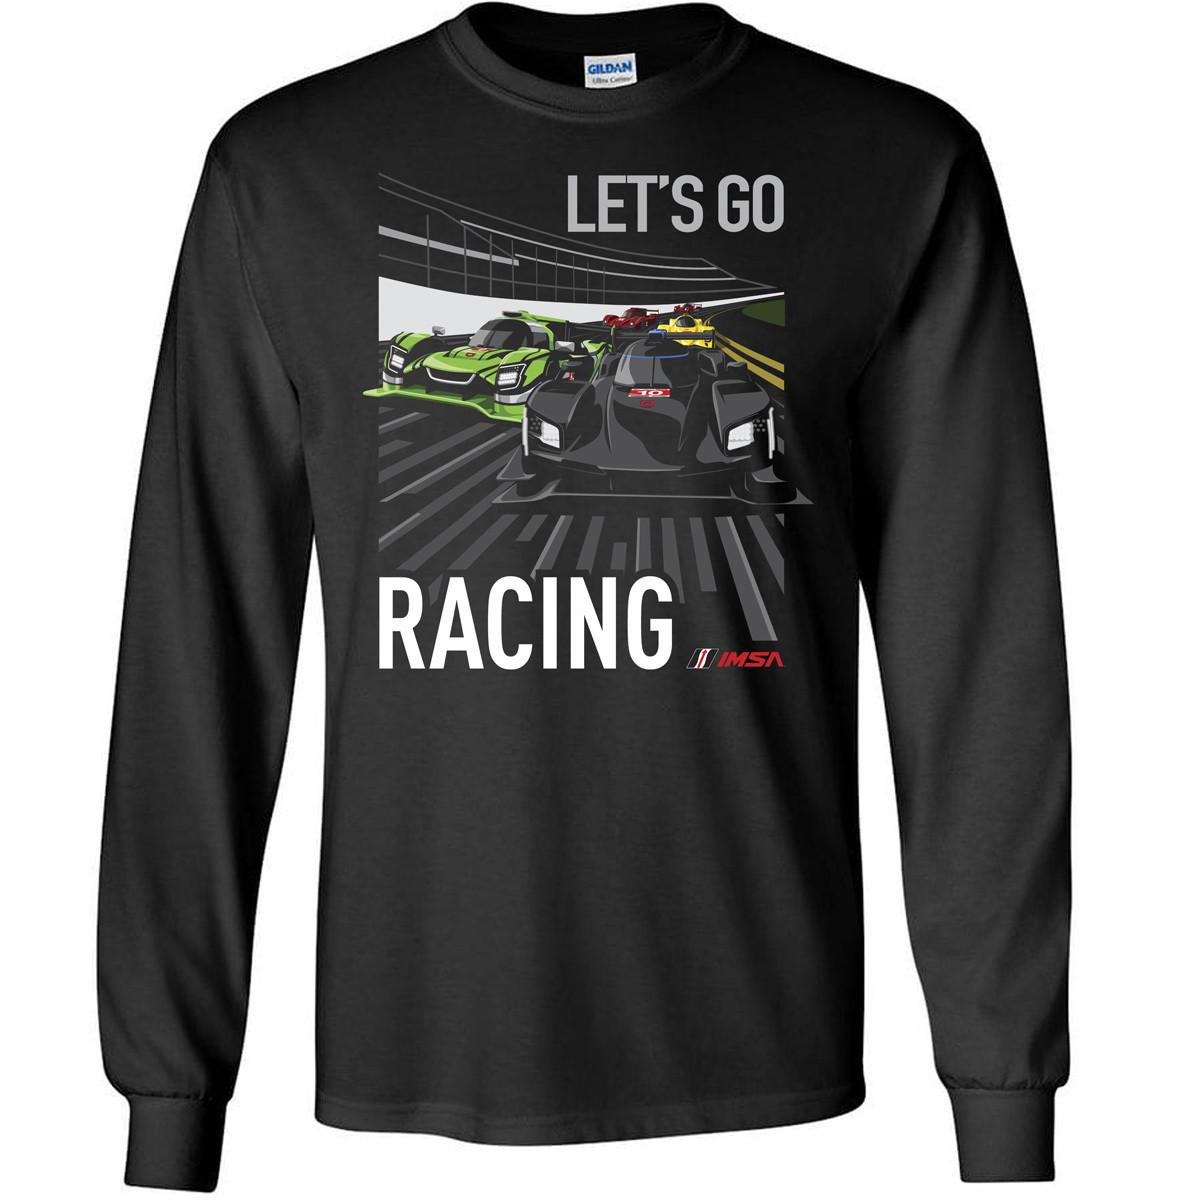 Lets Go Racing Long Sleeve Tee - Black